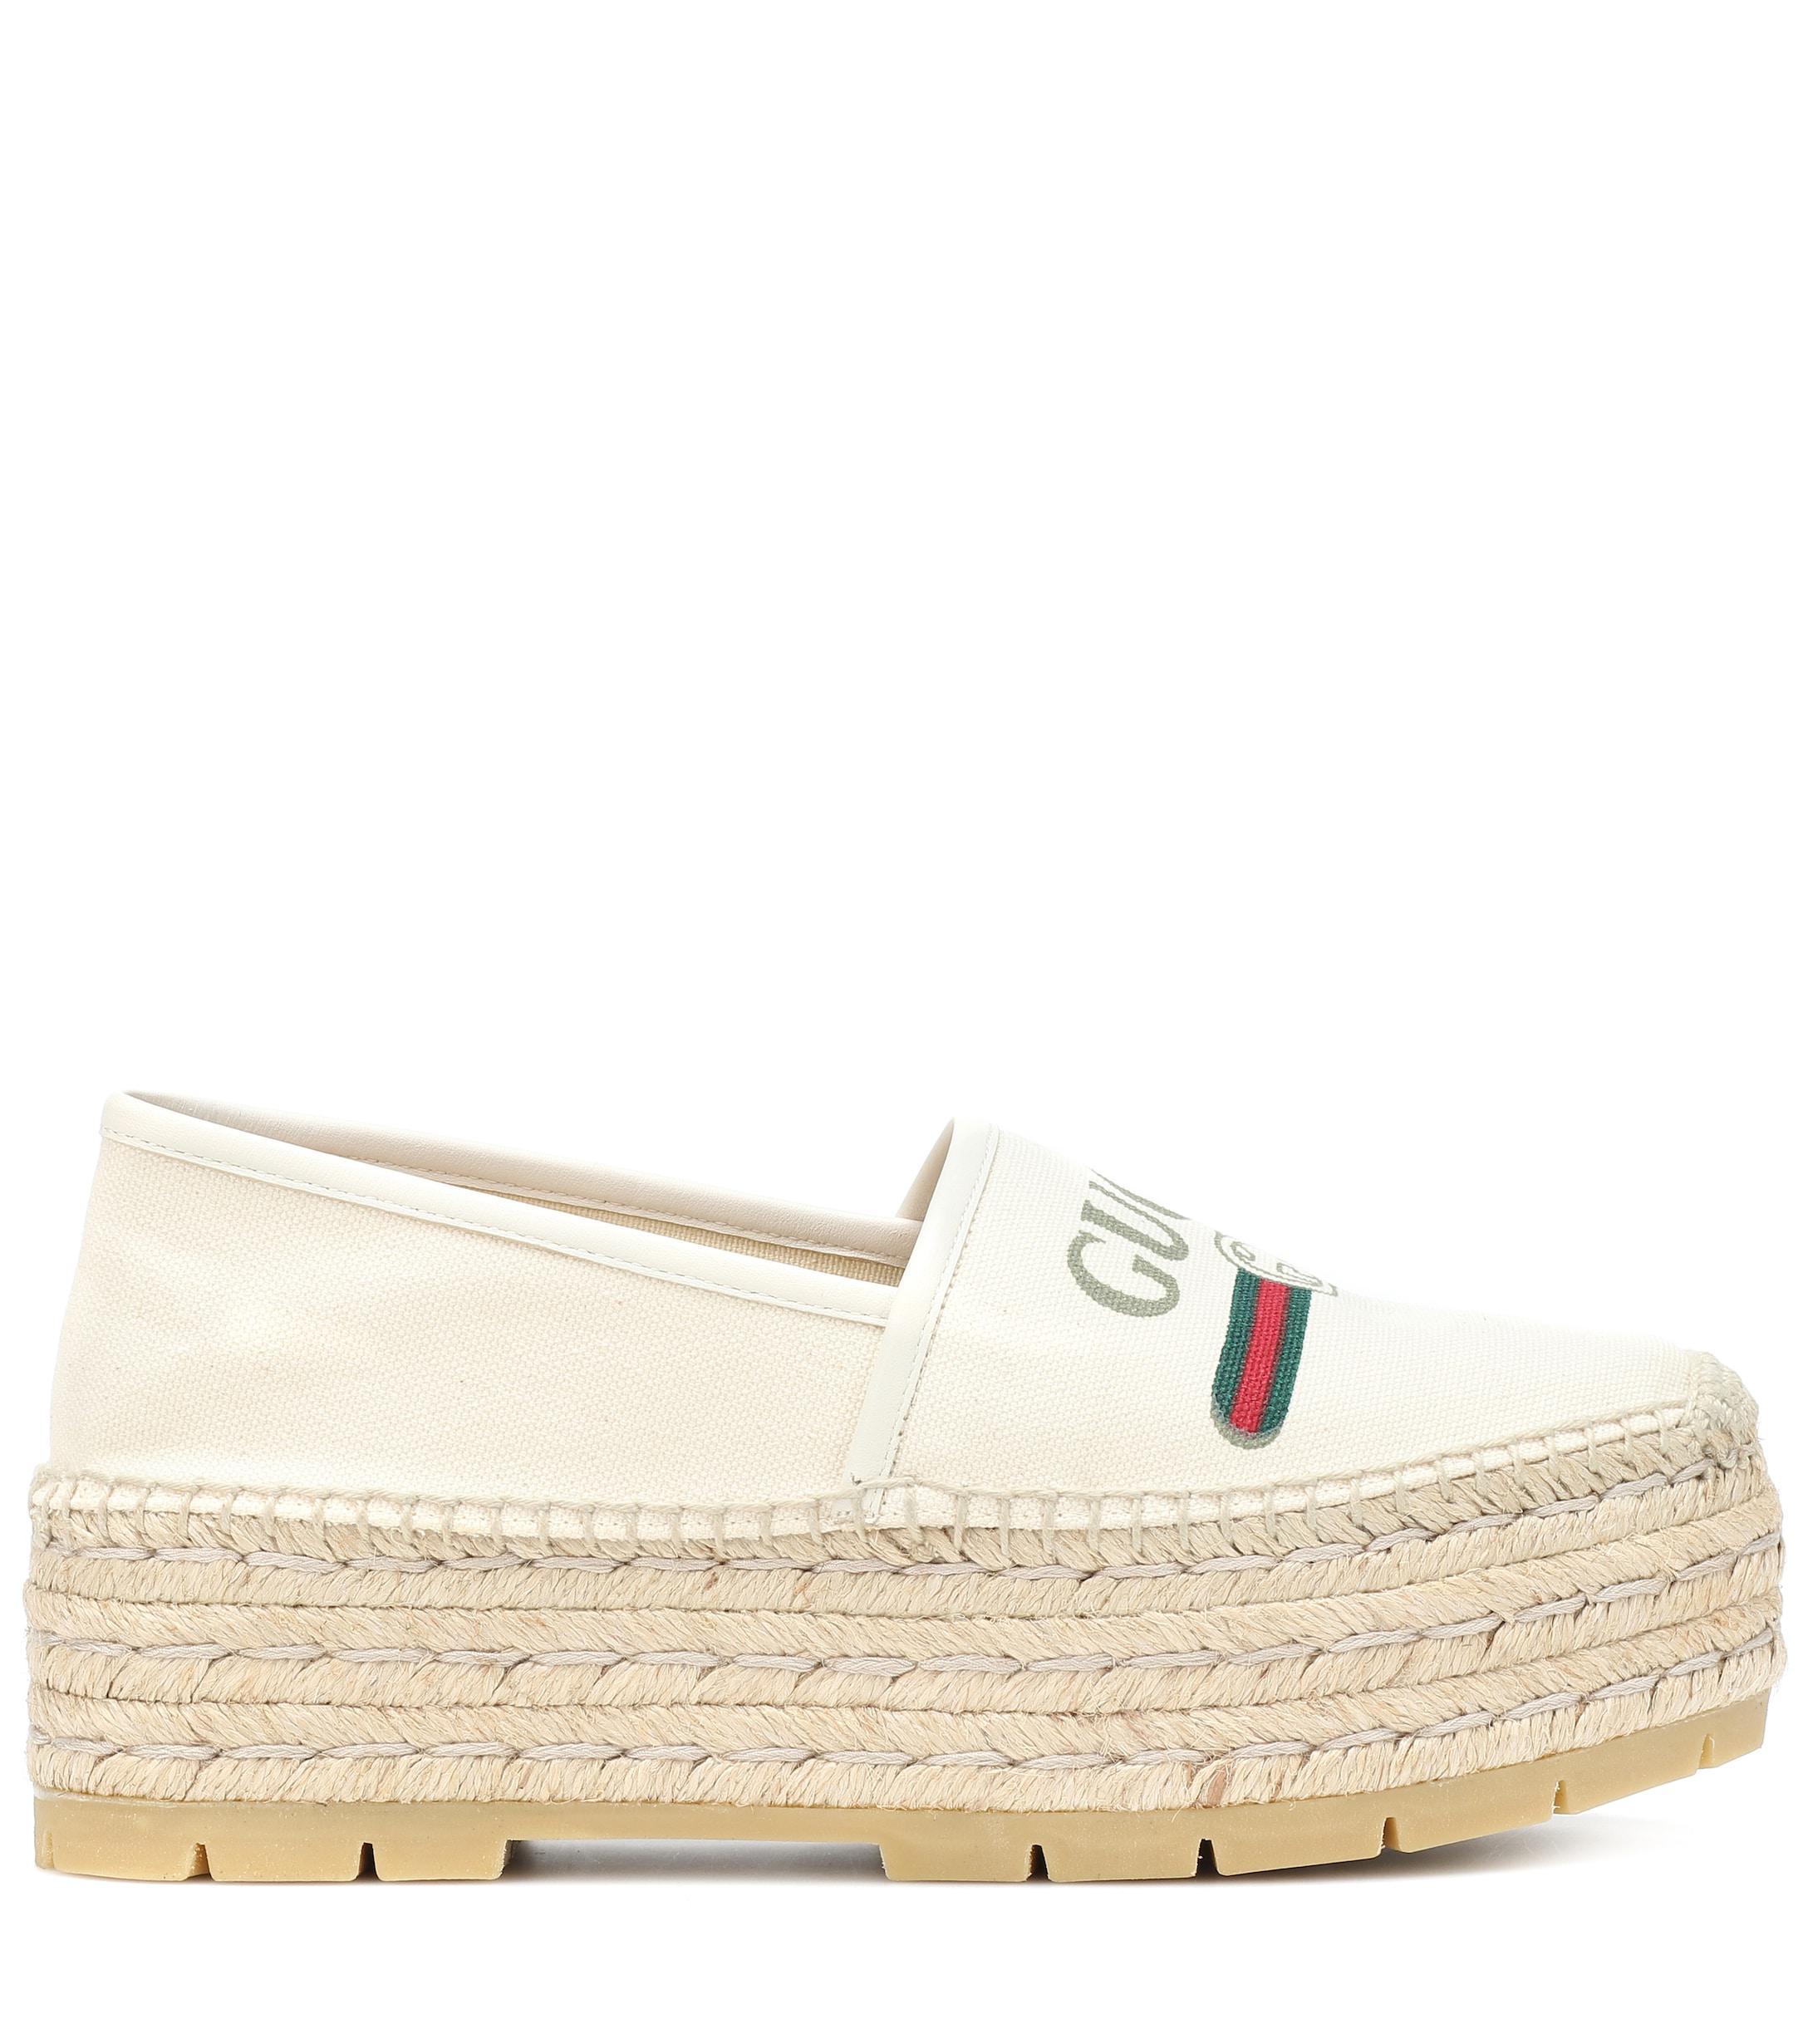 e8334ca4a Gucci Logo Platform Canvas Espadrilles in White - Lyst